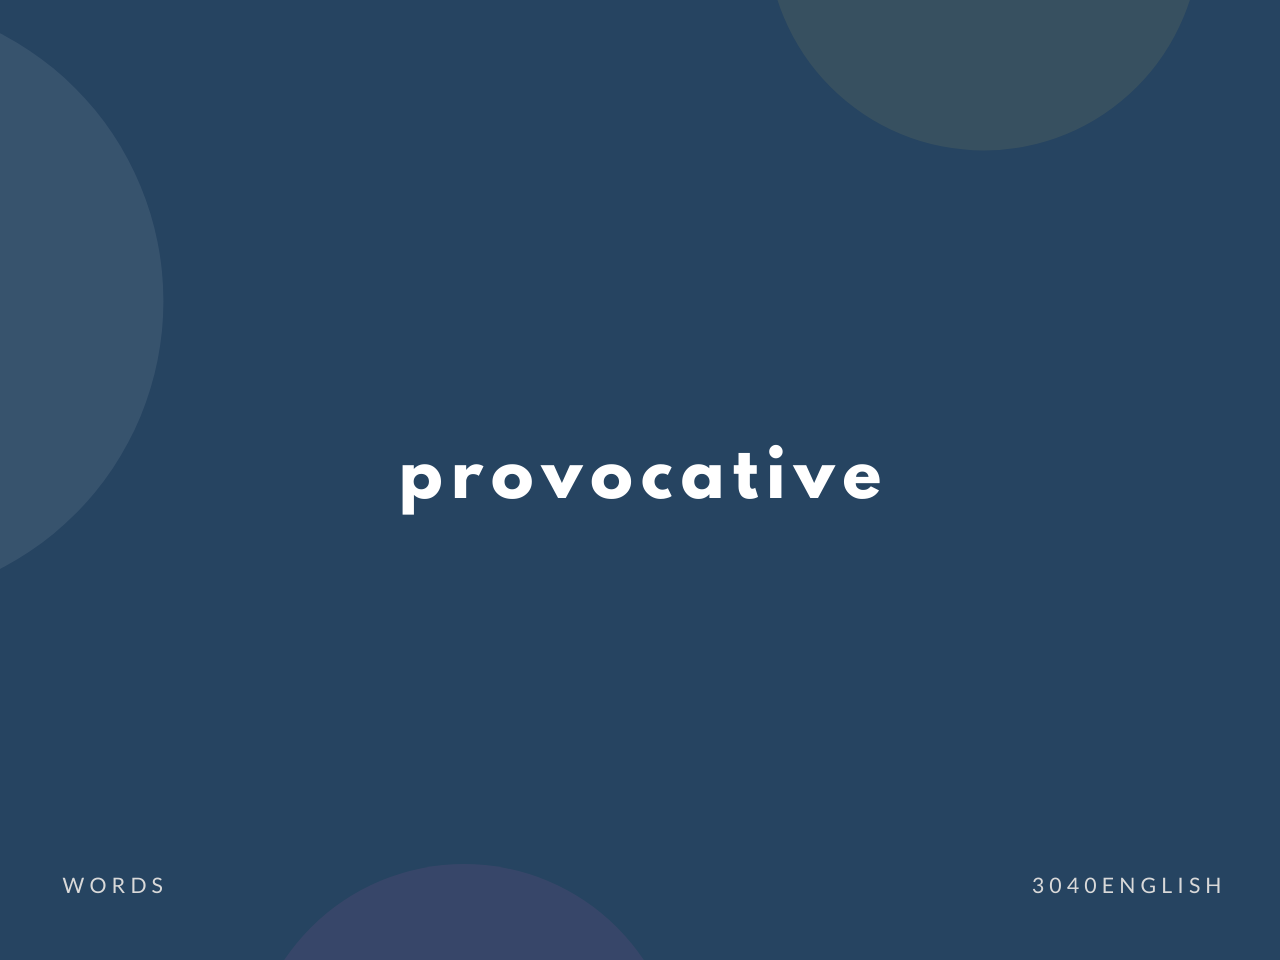 provocative の意味と簡単な使い方【音読用例文あり】